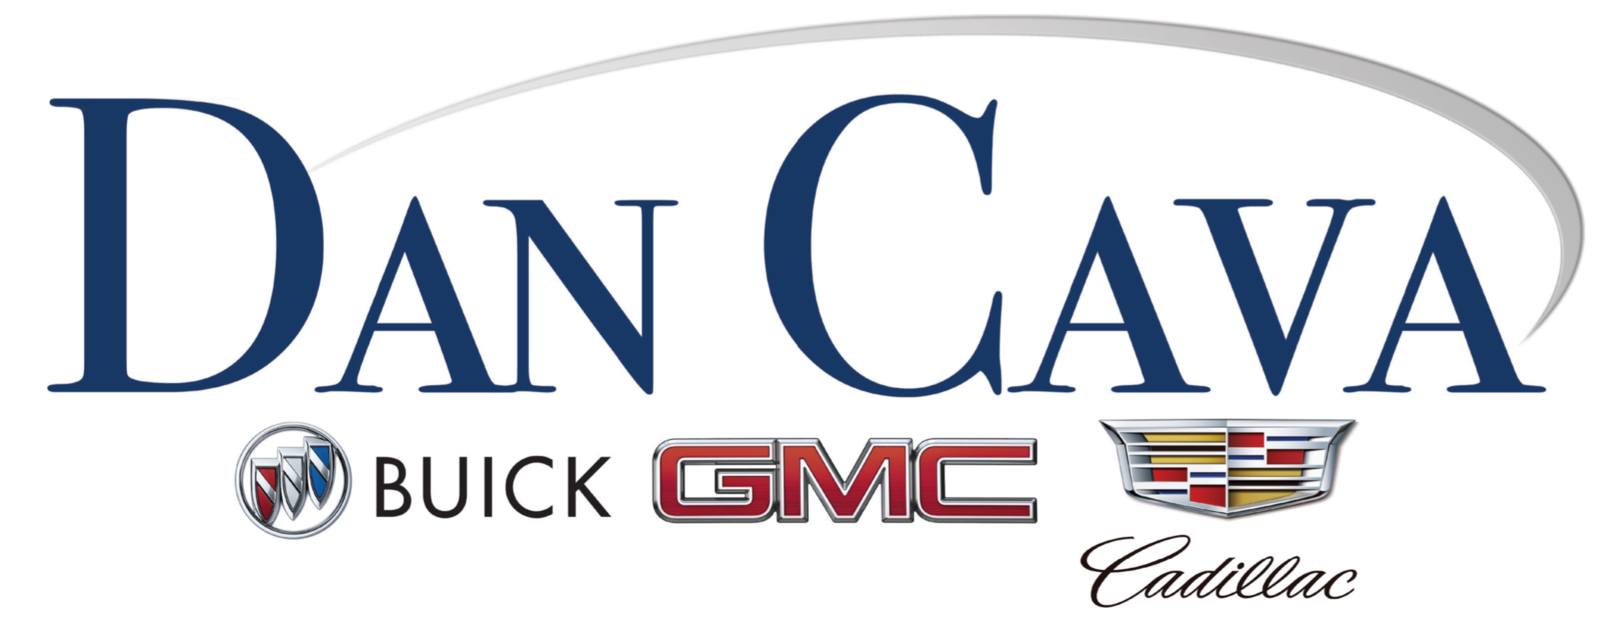 Gmc Dealers In Wv >> Dan Cava Buick GMC and Cadillac - Clarksburg, WV: Read